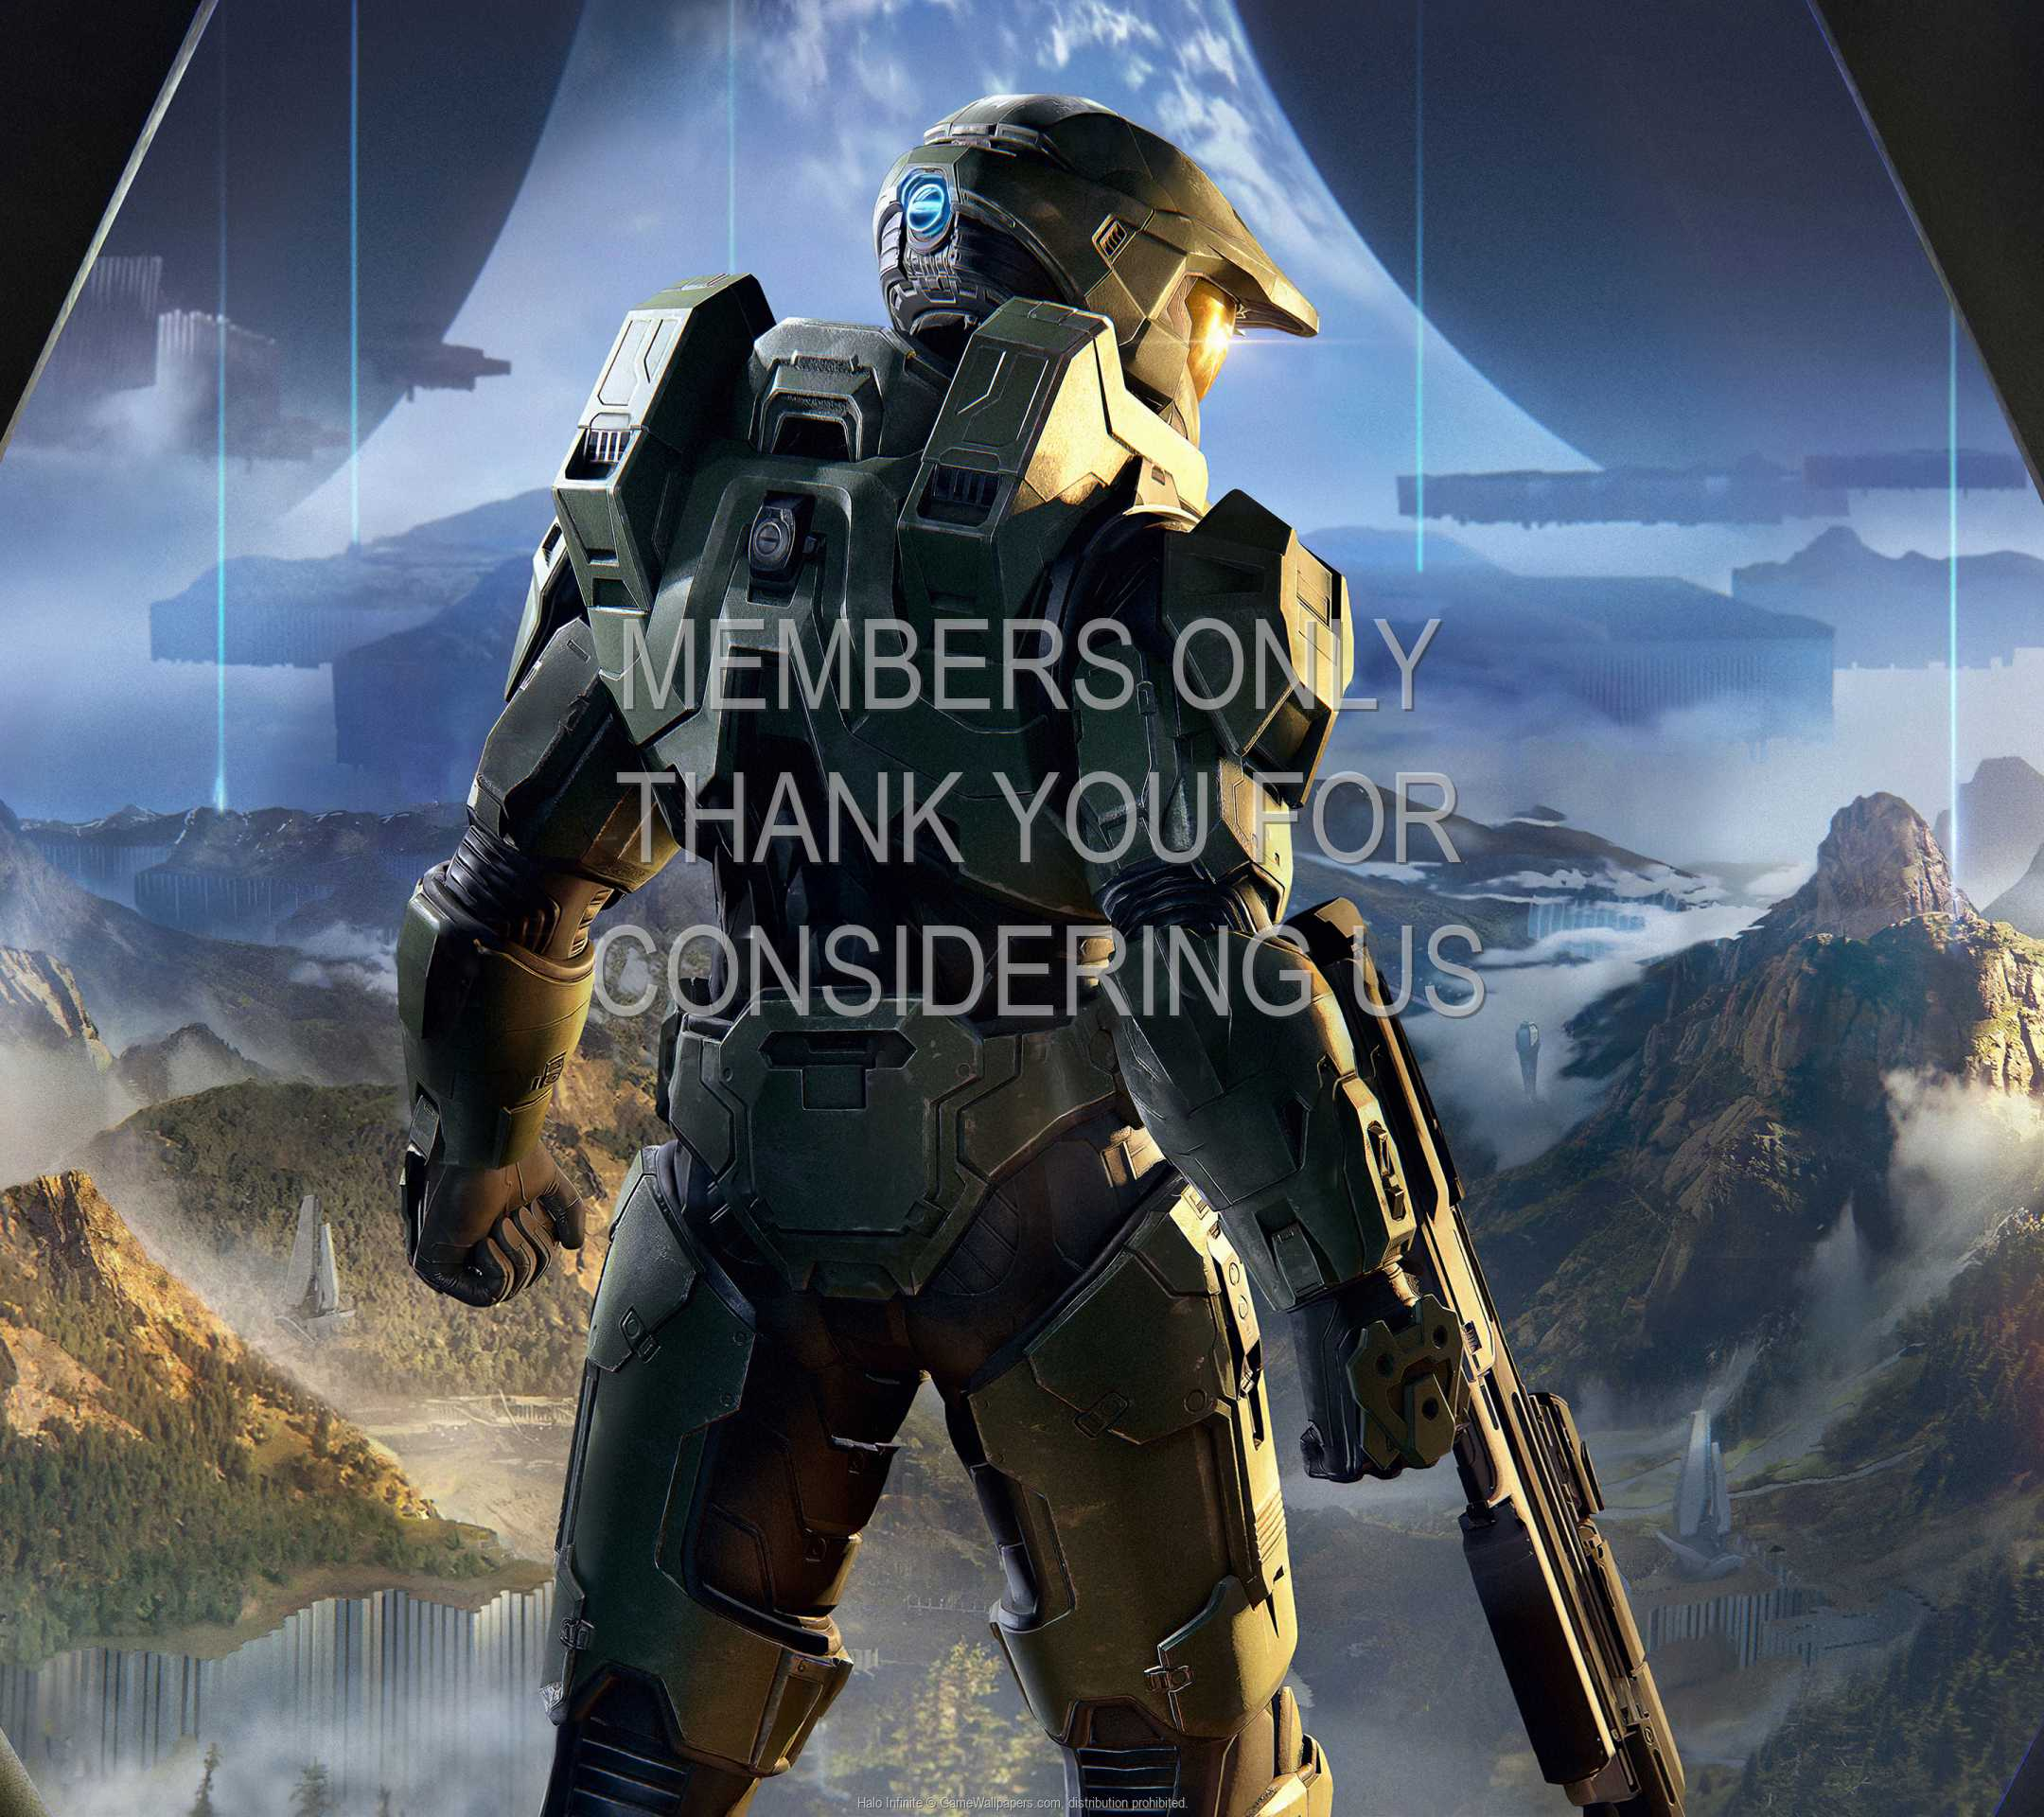 Halo: Infinite 1080p Horizontal Handy Hintergrundbild 02